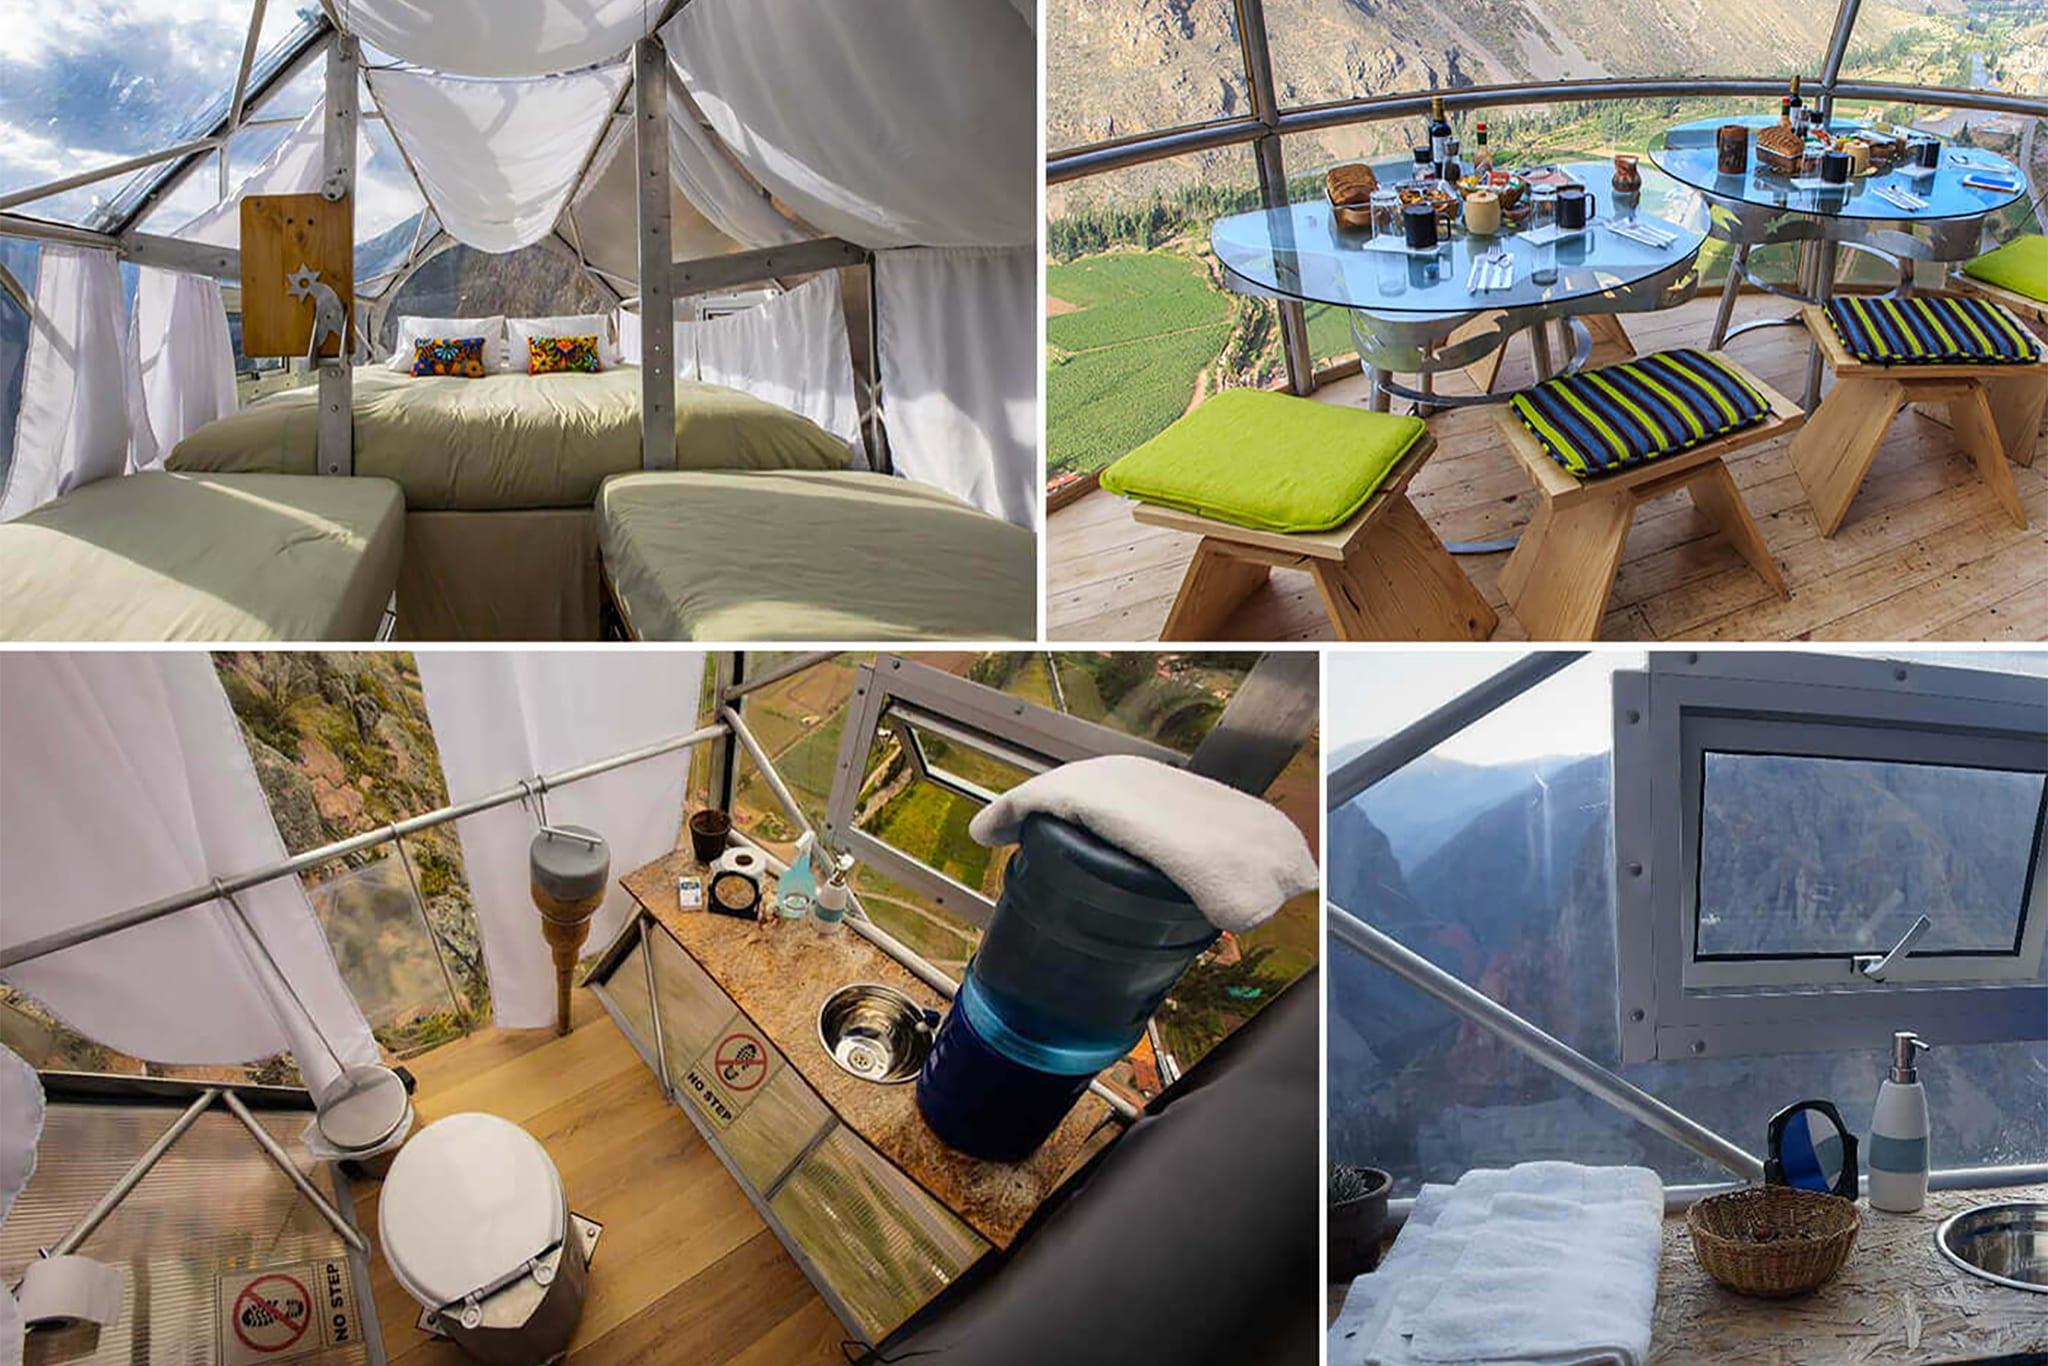 Sky Lodge Adventure Suites 2 Days Peru Flashpackerconnect Adventure Travel